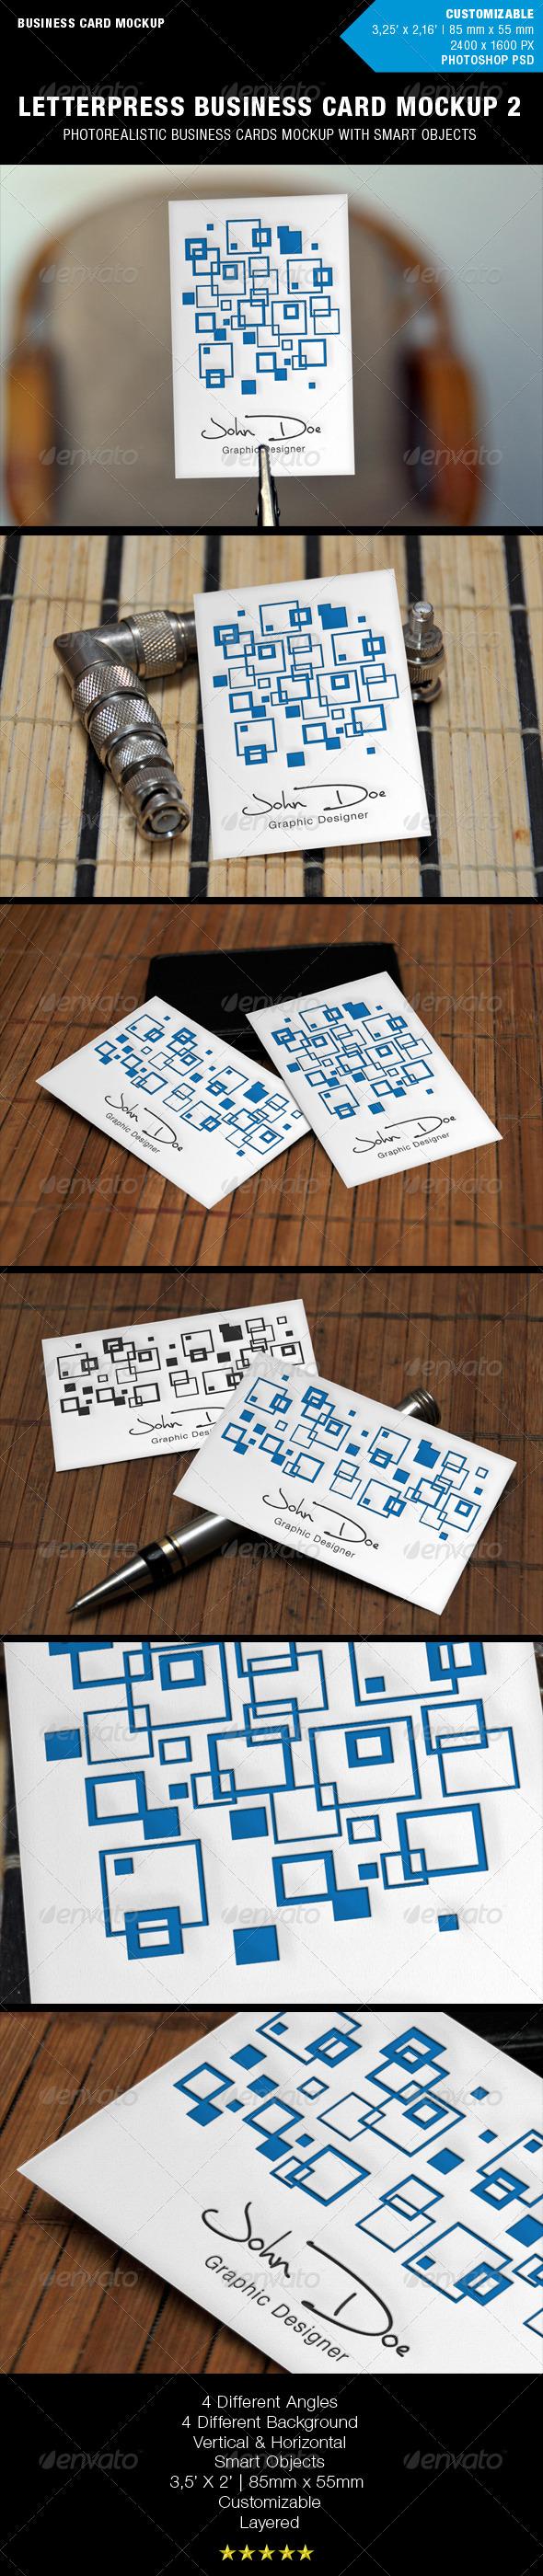 GraphicRiver Letterpress Business Card Mockup 2 1097295